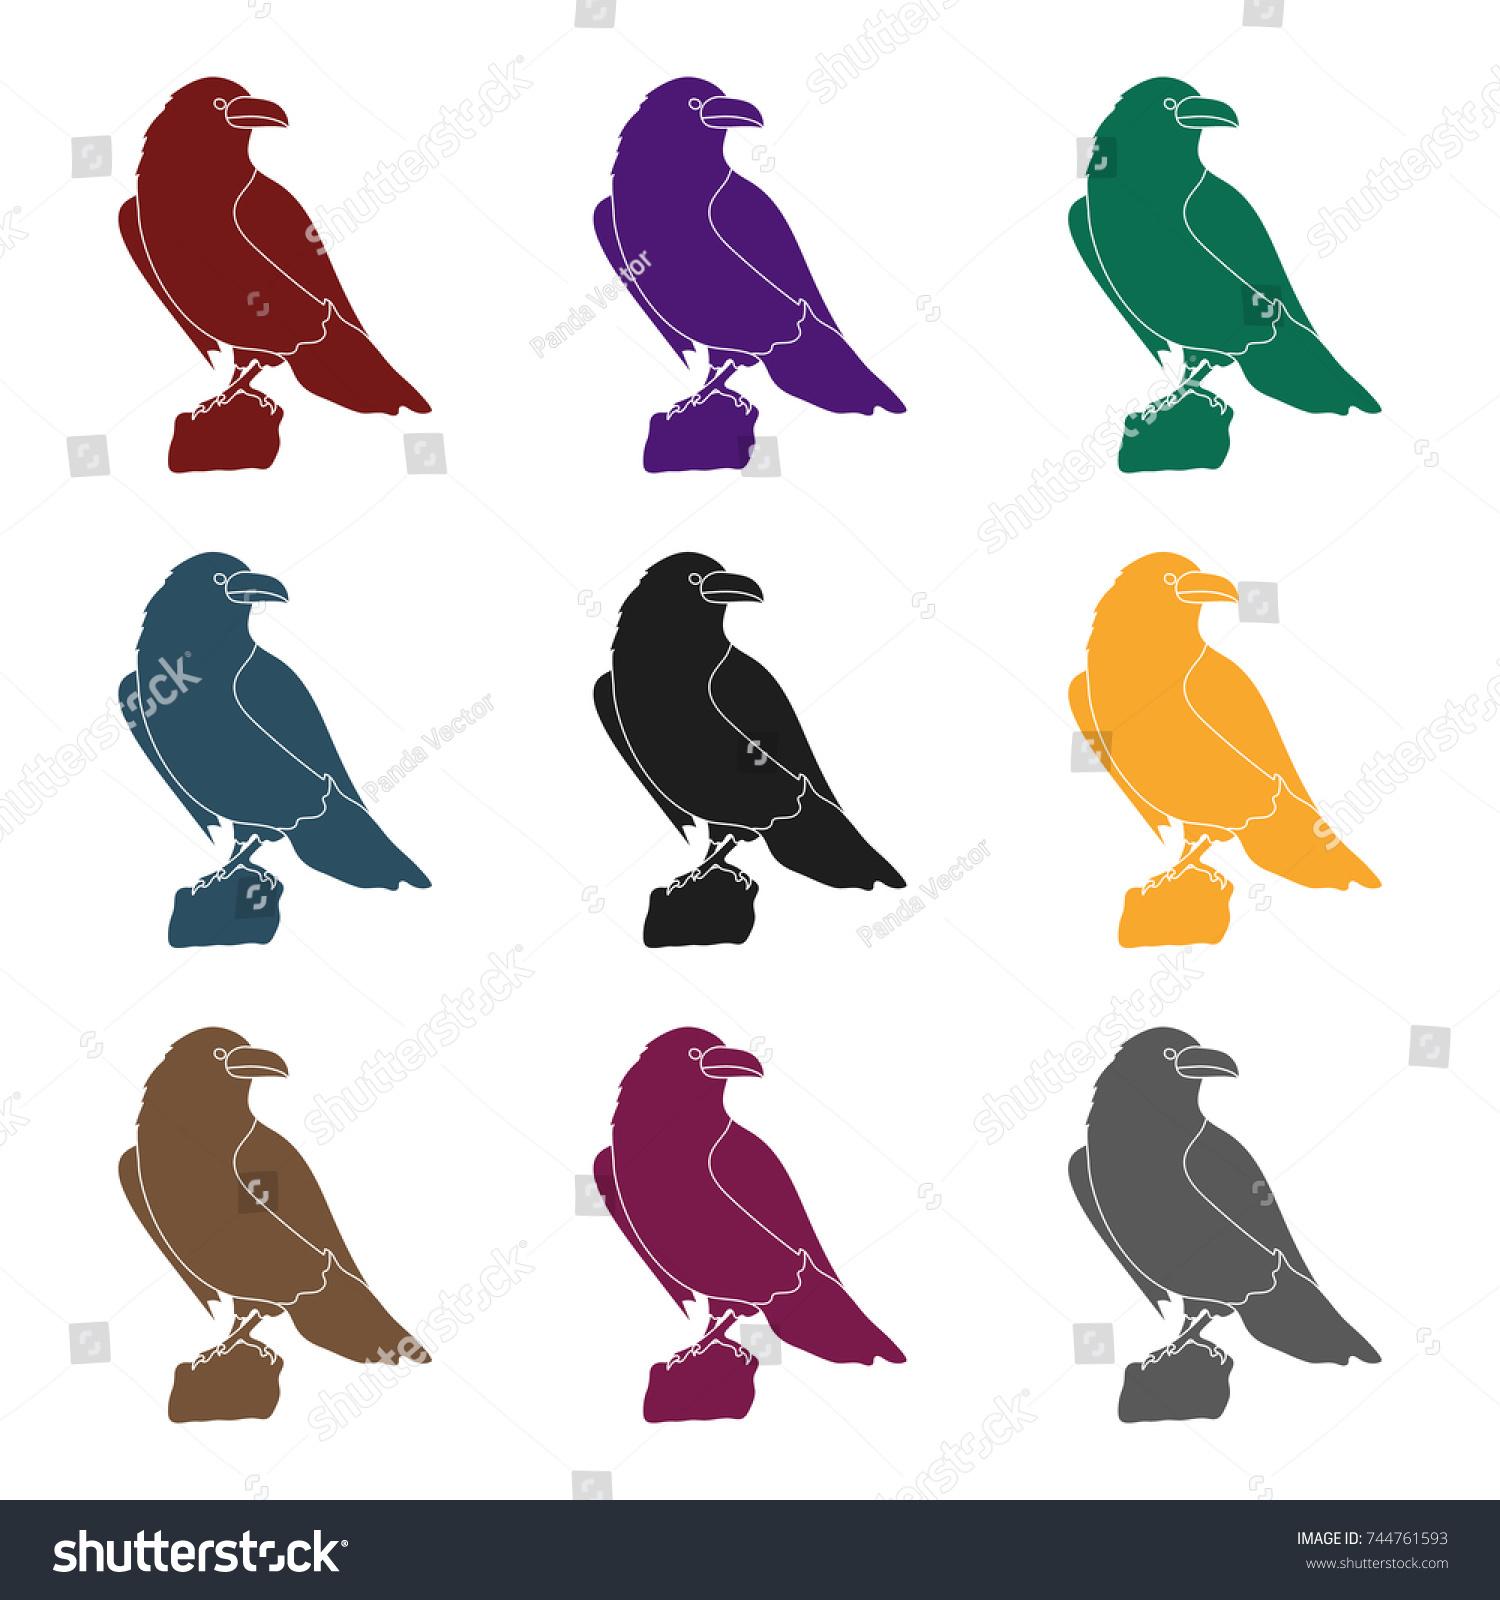 Crow Viking God Icon Black Style Stock Vector 744761593 Shutterstock